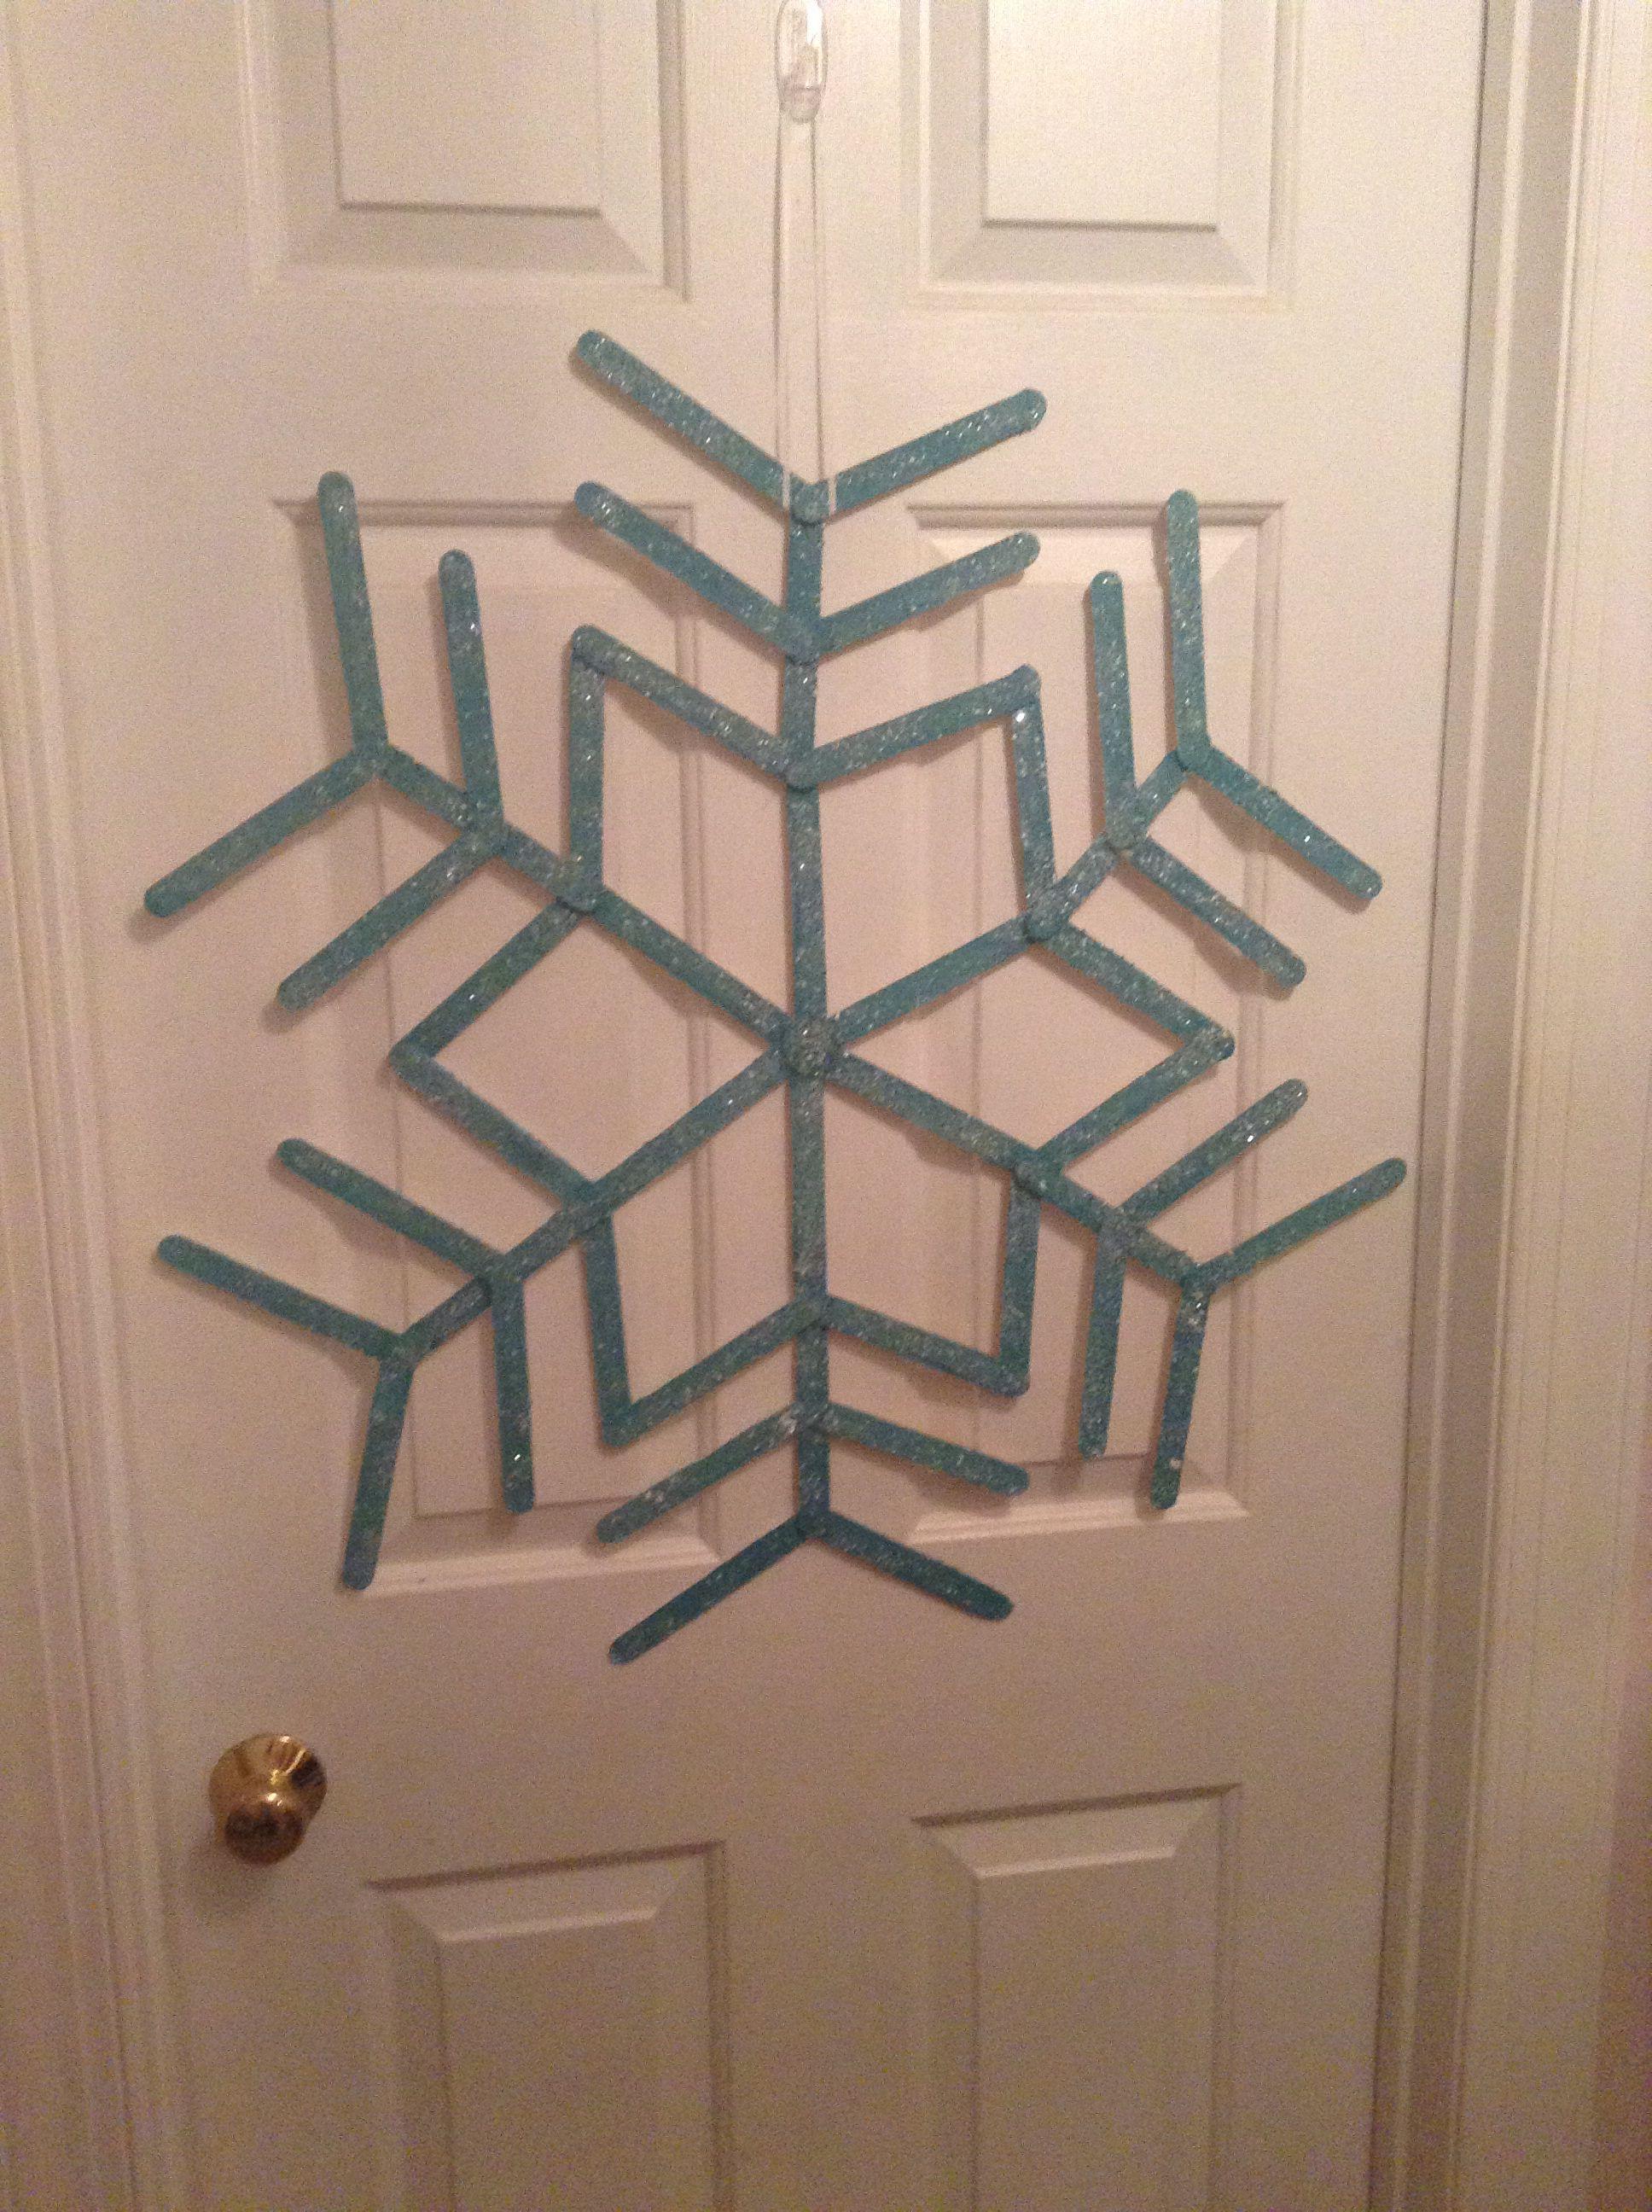 Popsicle stick snowflake craft Pinterest